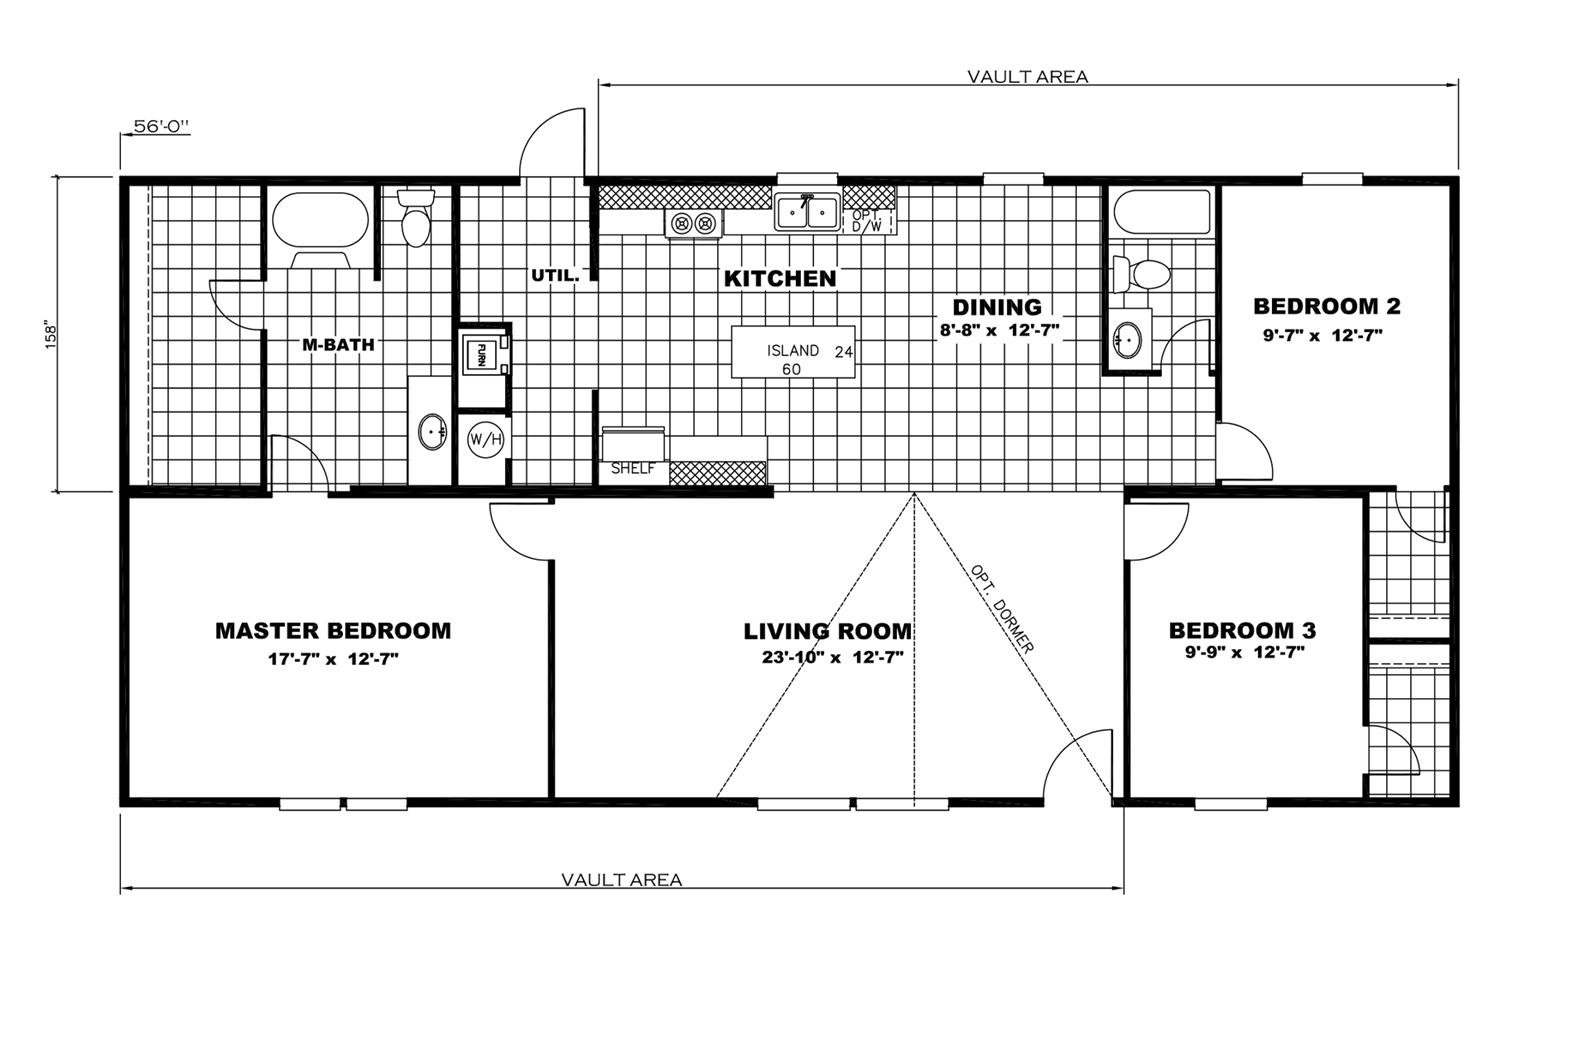 X Mobile Home Floor Plan on 28 x 56 mobile home, 24 x 56 mobile home, 16 x 56 mobile home, 28x60 mobile home, 24 x 48 mobile home,